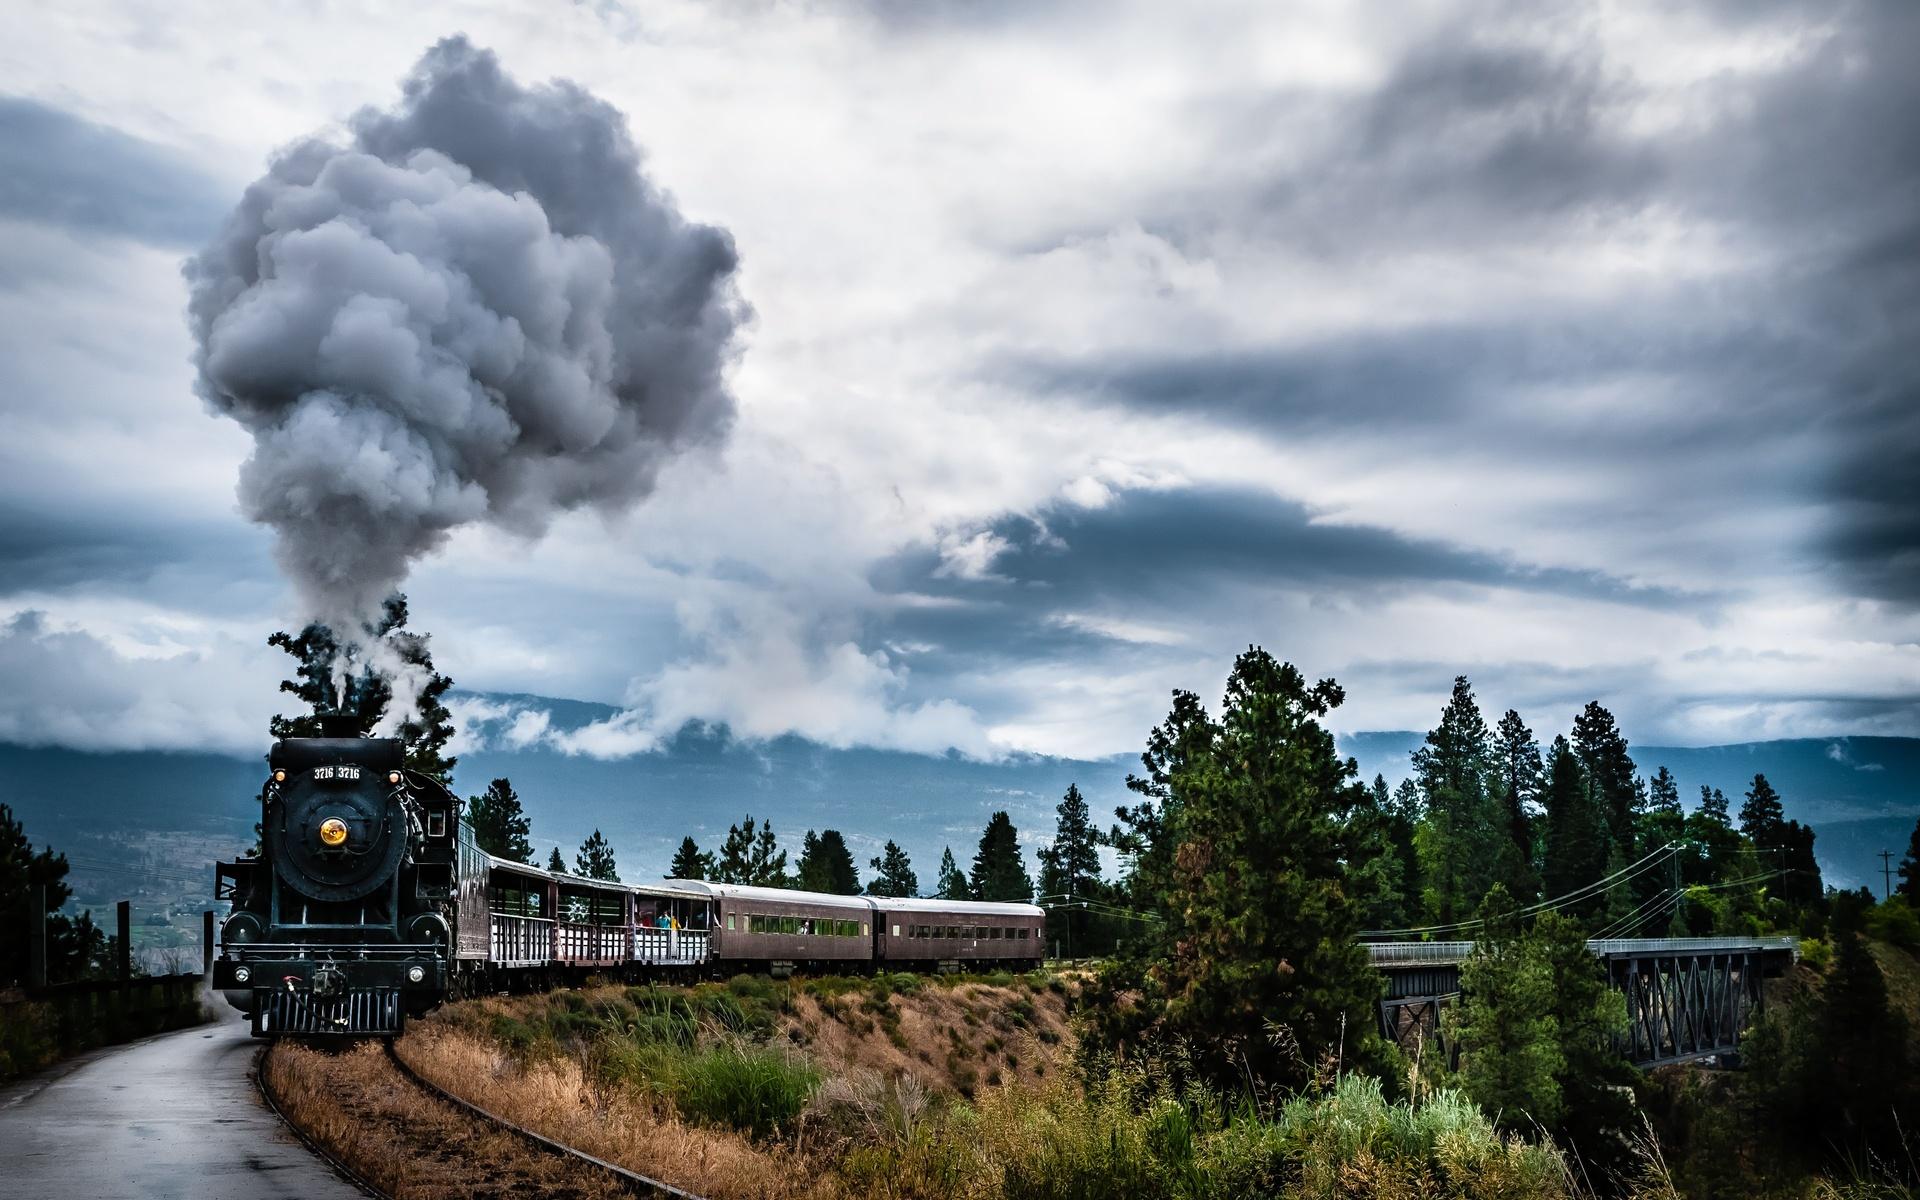 engines locomotive retro classic tracks railroad smoke wallpaper background